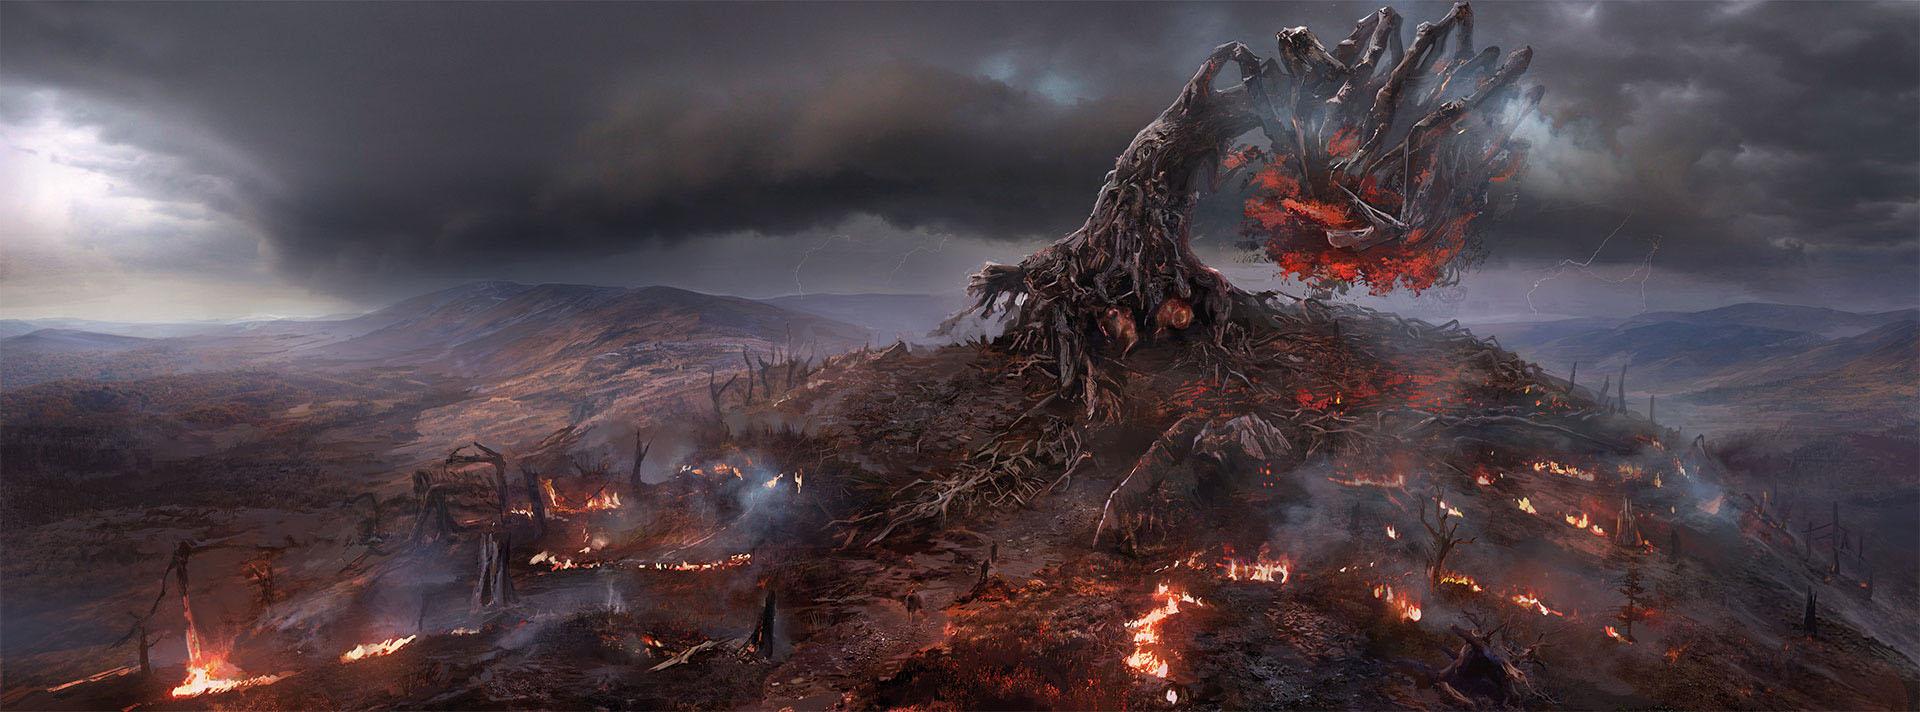 Cen�rio do jogo The Witcher 3